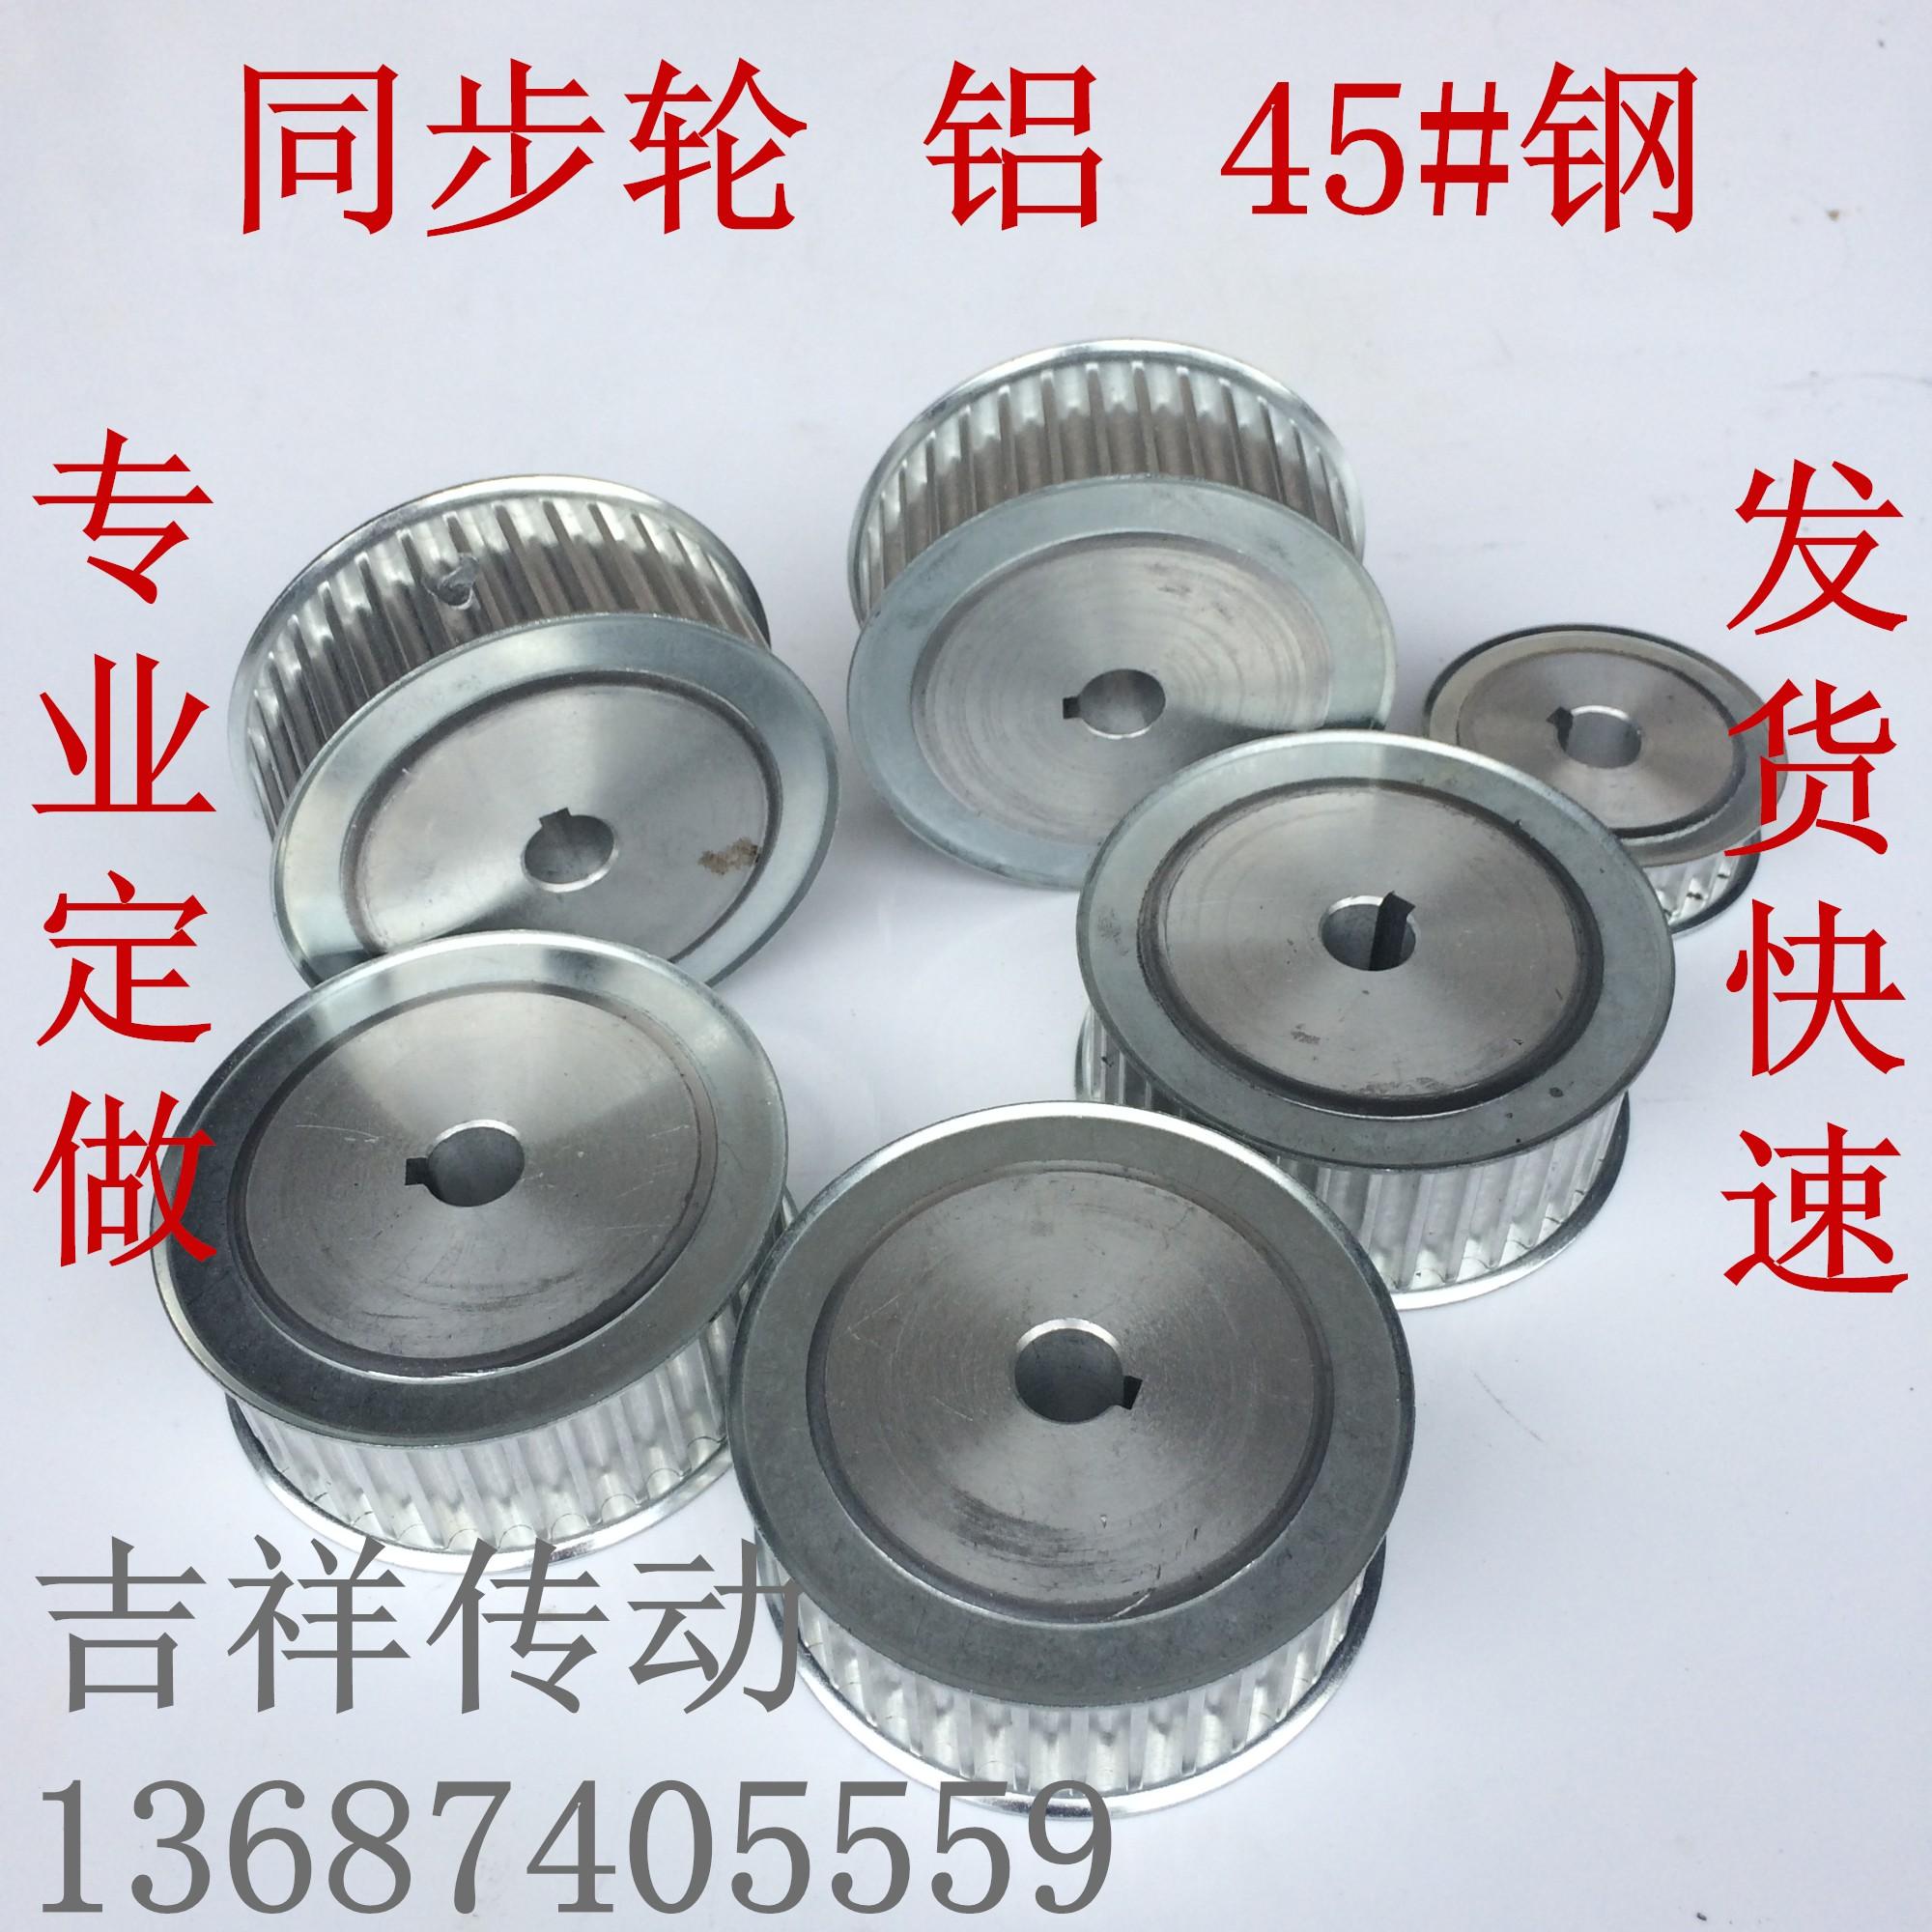 Стандарт синхронный круглый синхронный шкив  MXL XL L H XH 3M 5M 8M 14M T5 T10 AT10